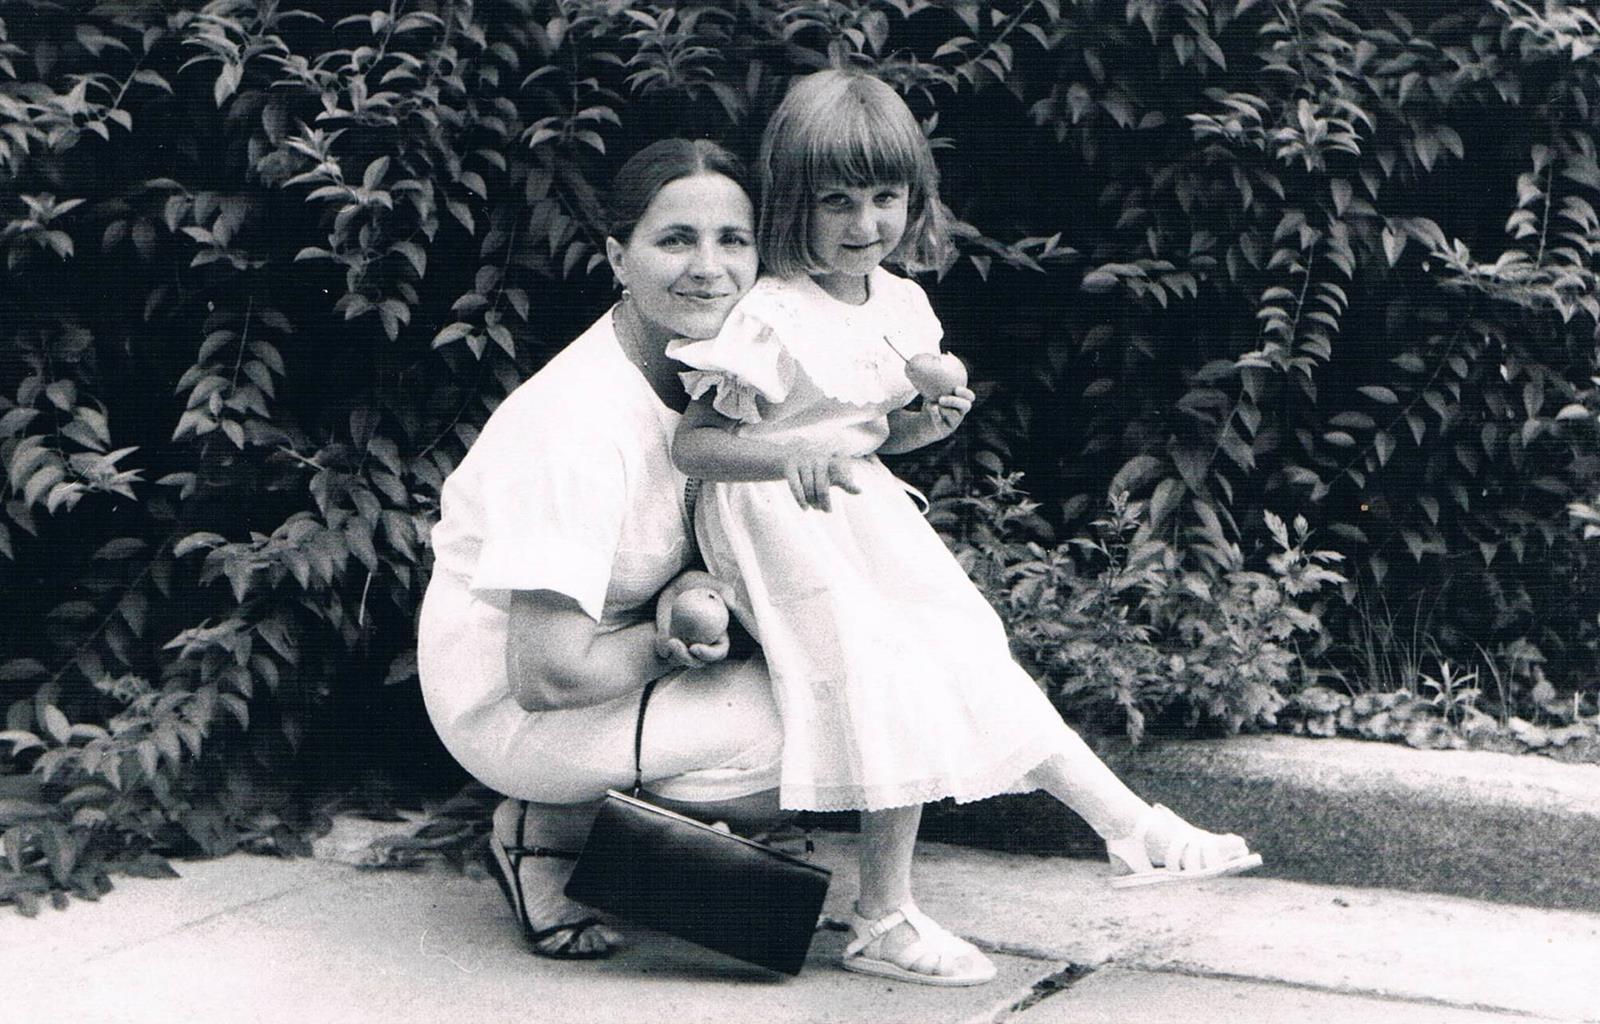 Тоня Матвиенко поздравила свою маму с Днем матери